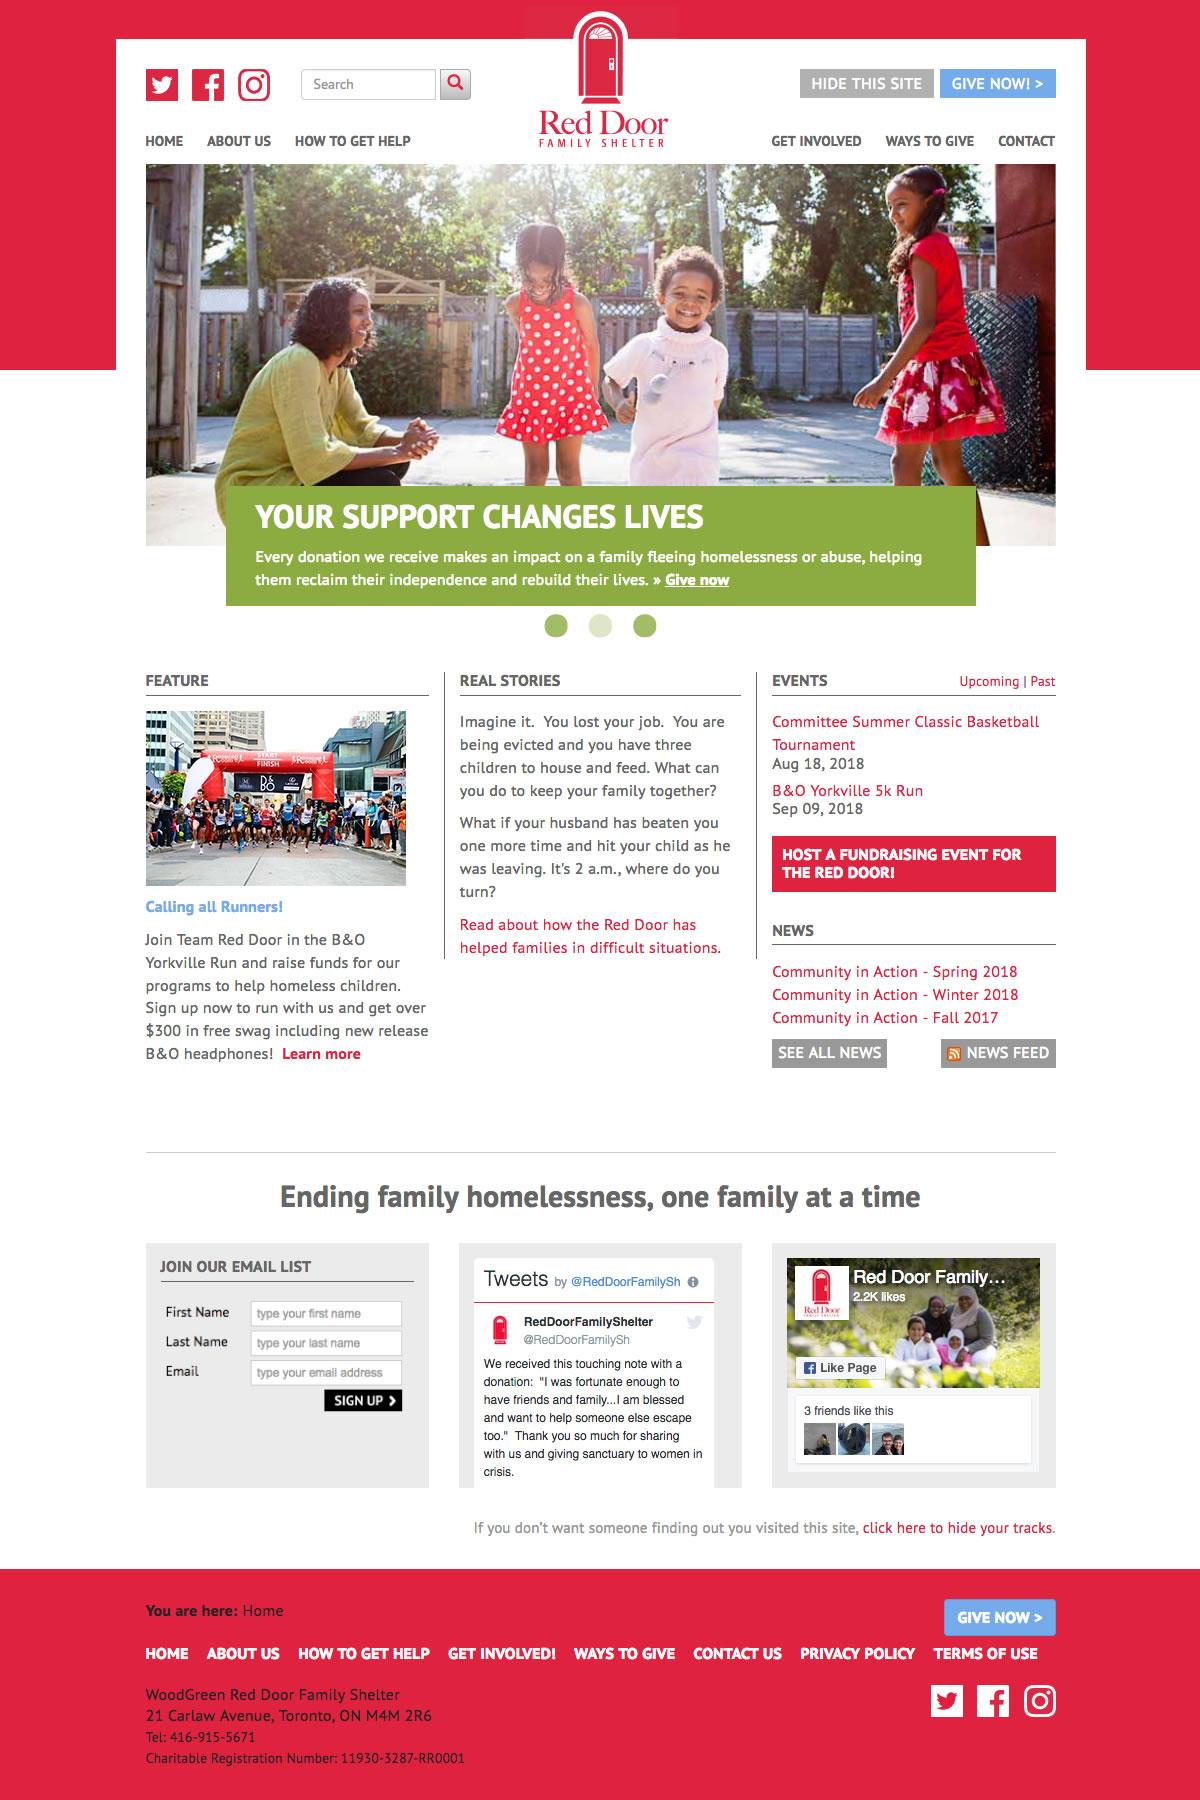 Red Door Family Shelter web site screenshot